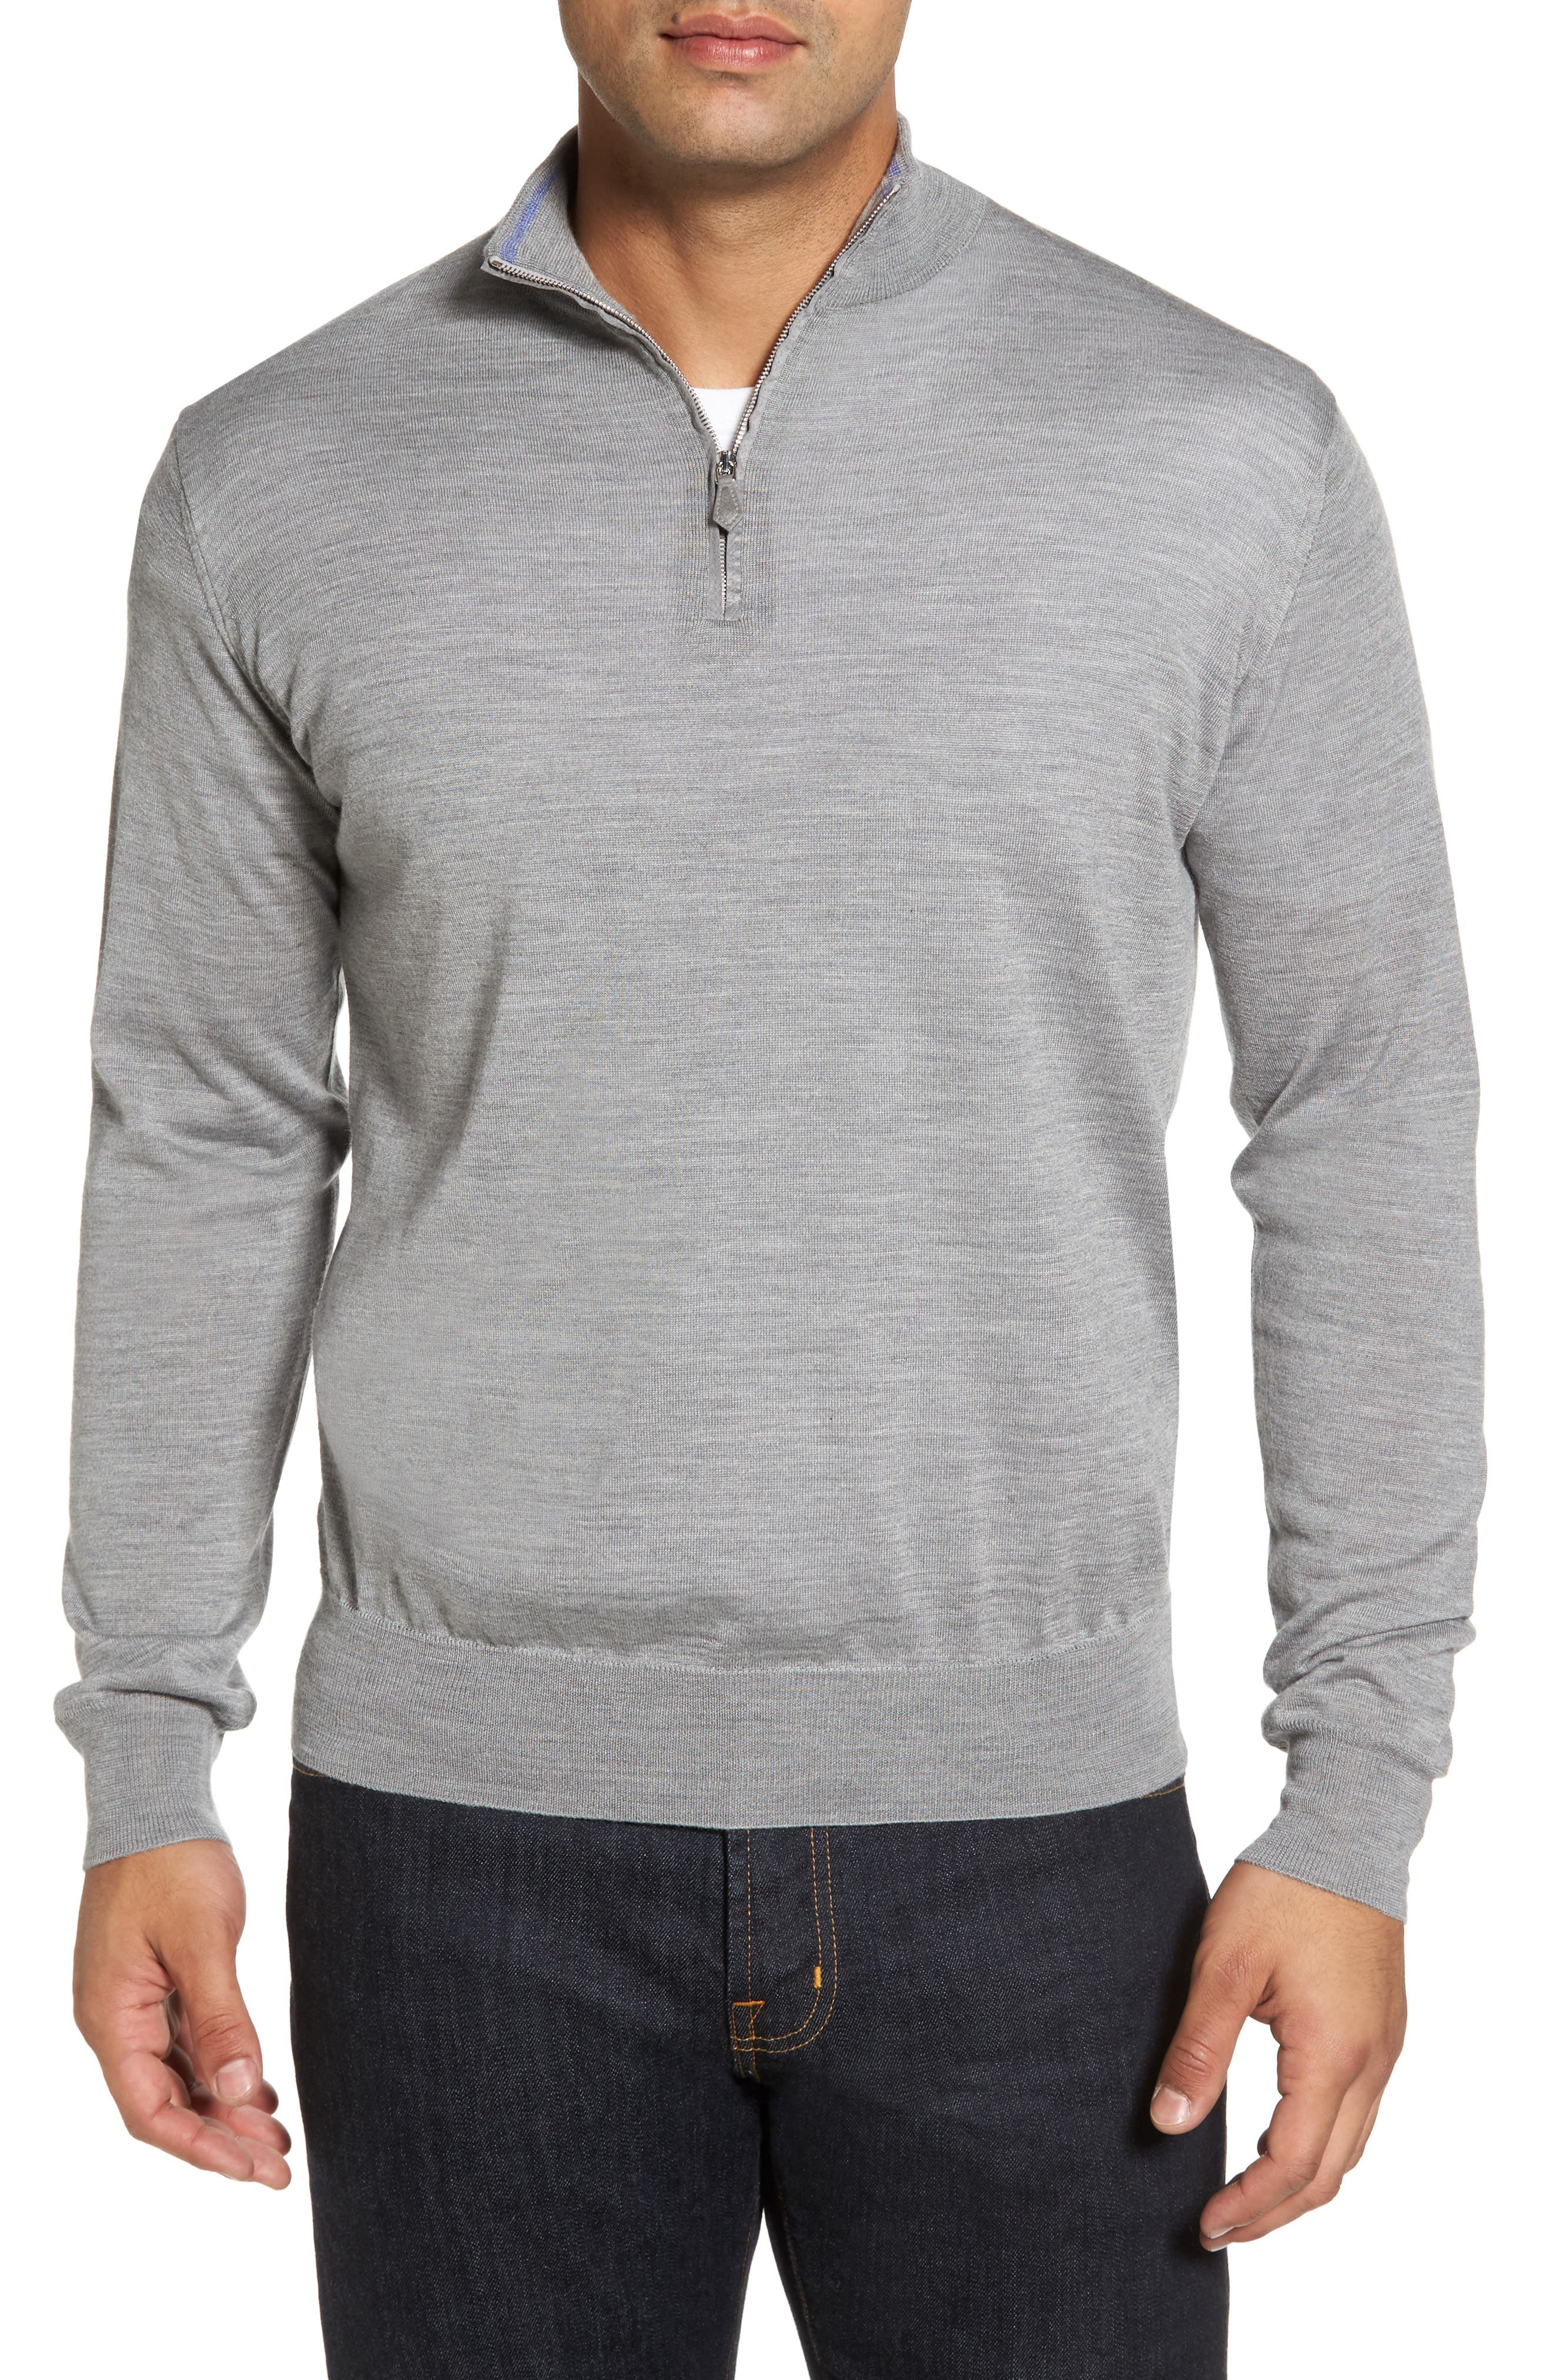 Wool Blend Quarter Zip Sweater,                             Main thumbnail 1, color,